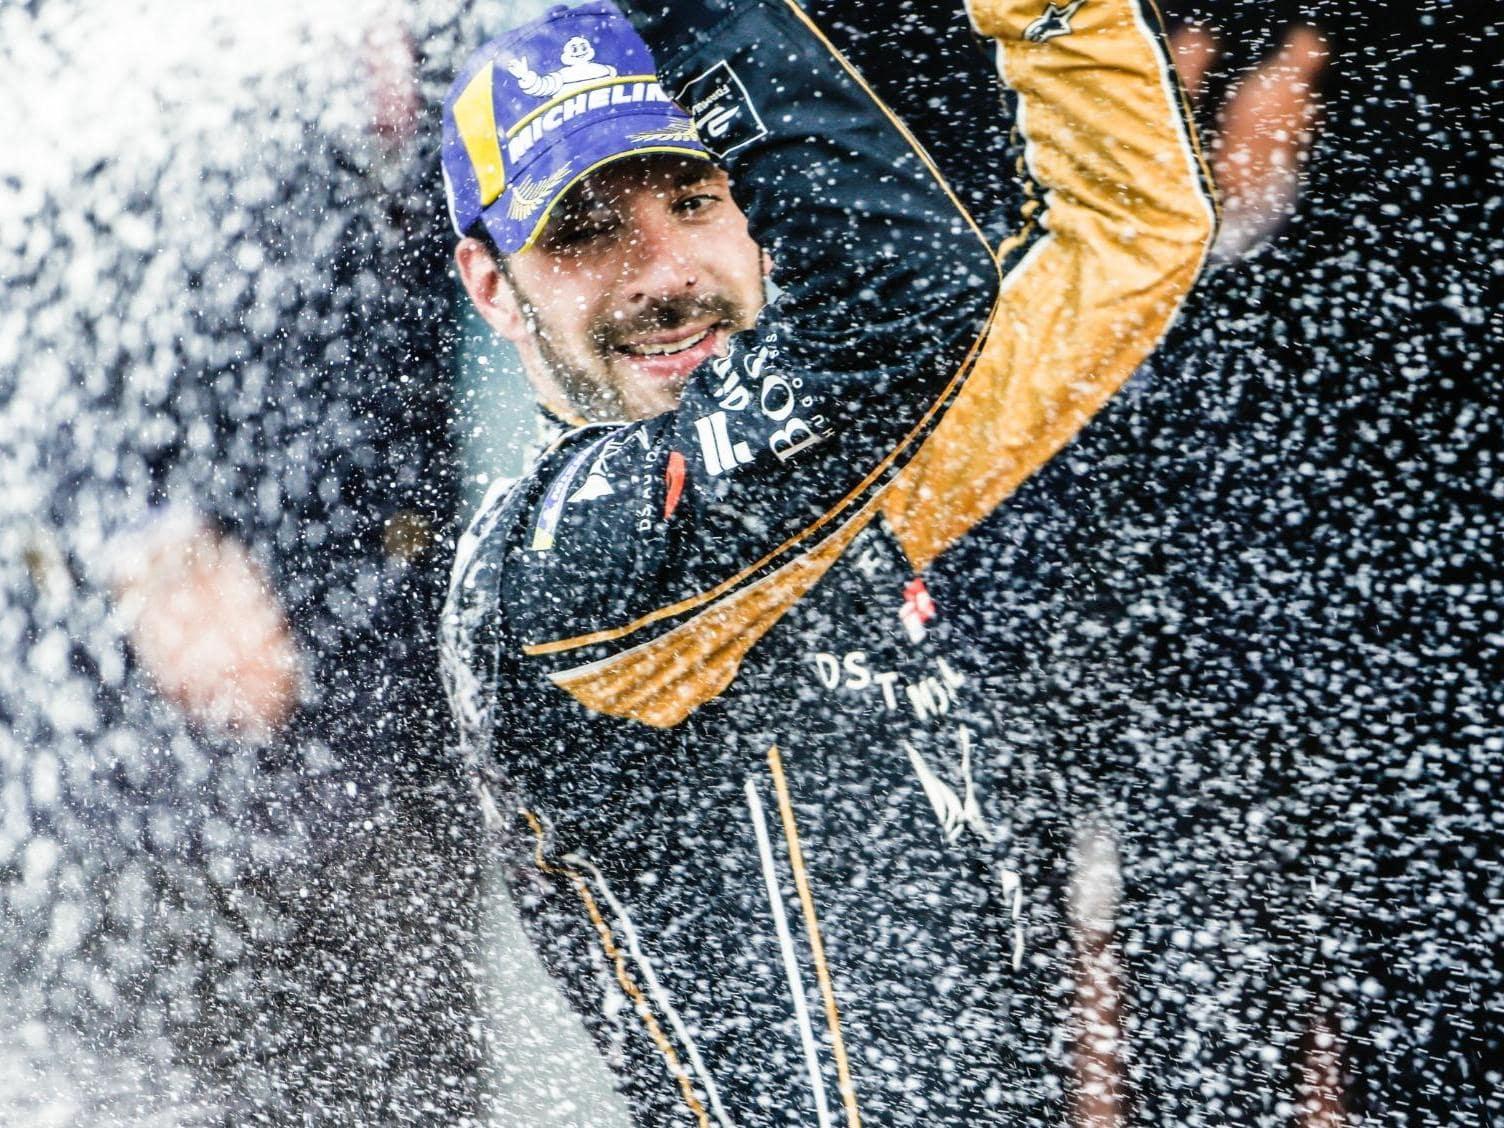 Vergne remporte l'e prix berne 2019